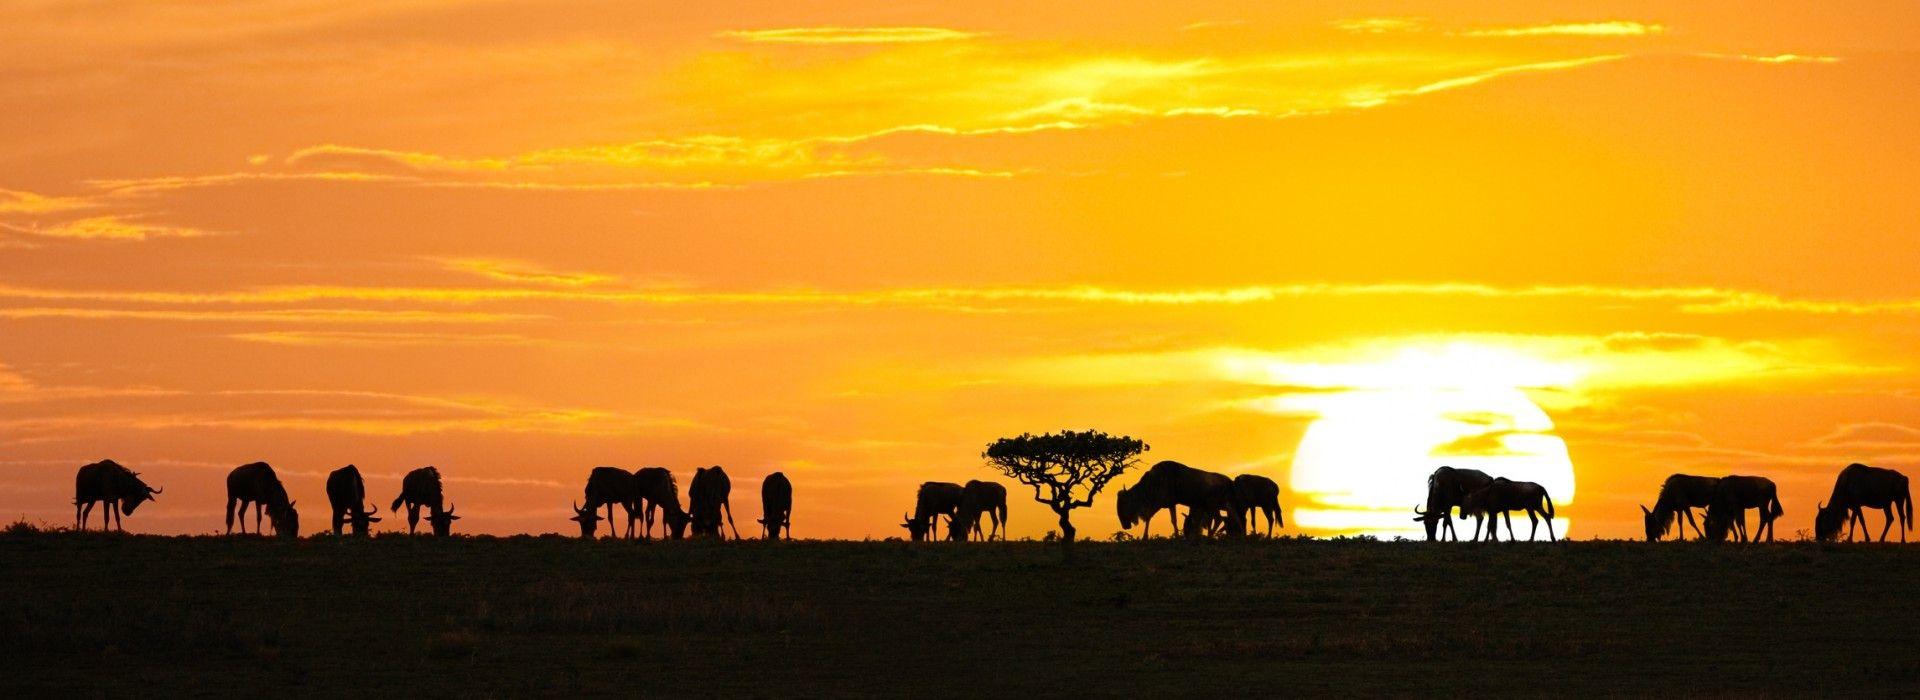 National parks Tours in Kilimanjaro